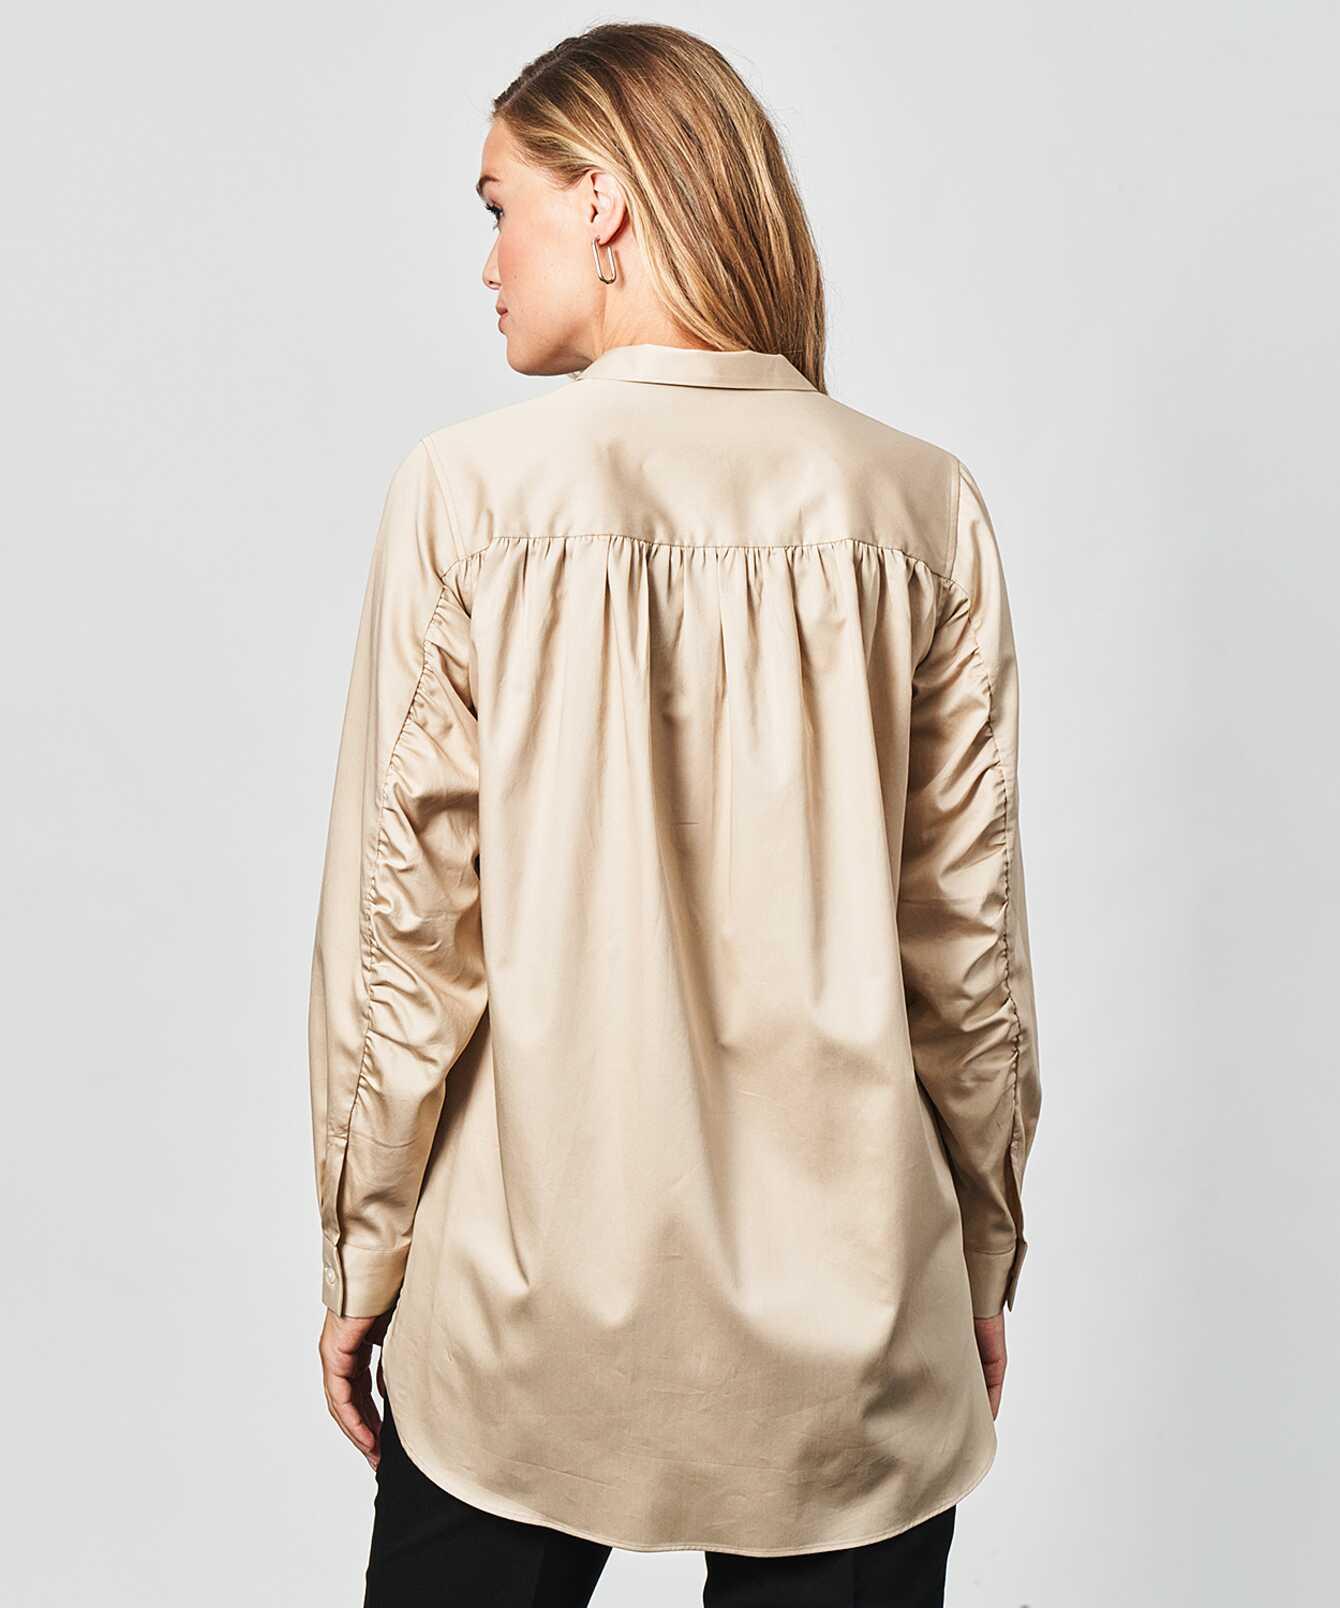 Skjorta Kayla Cotton Poplin Beige The Shirt Factory